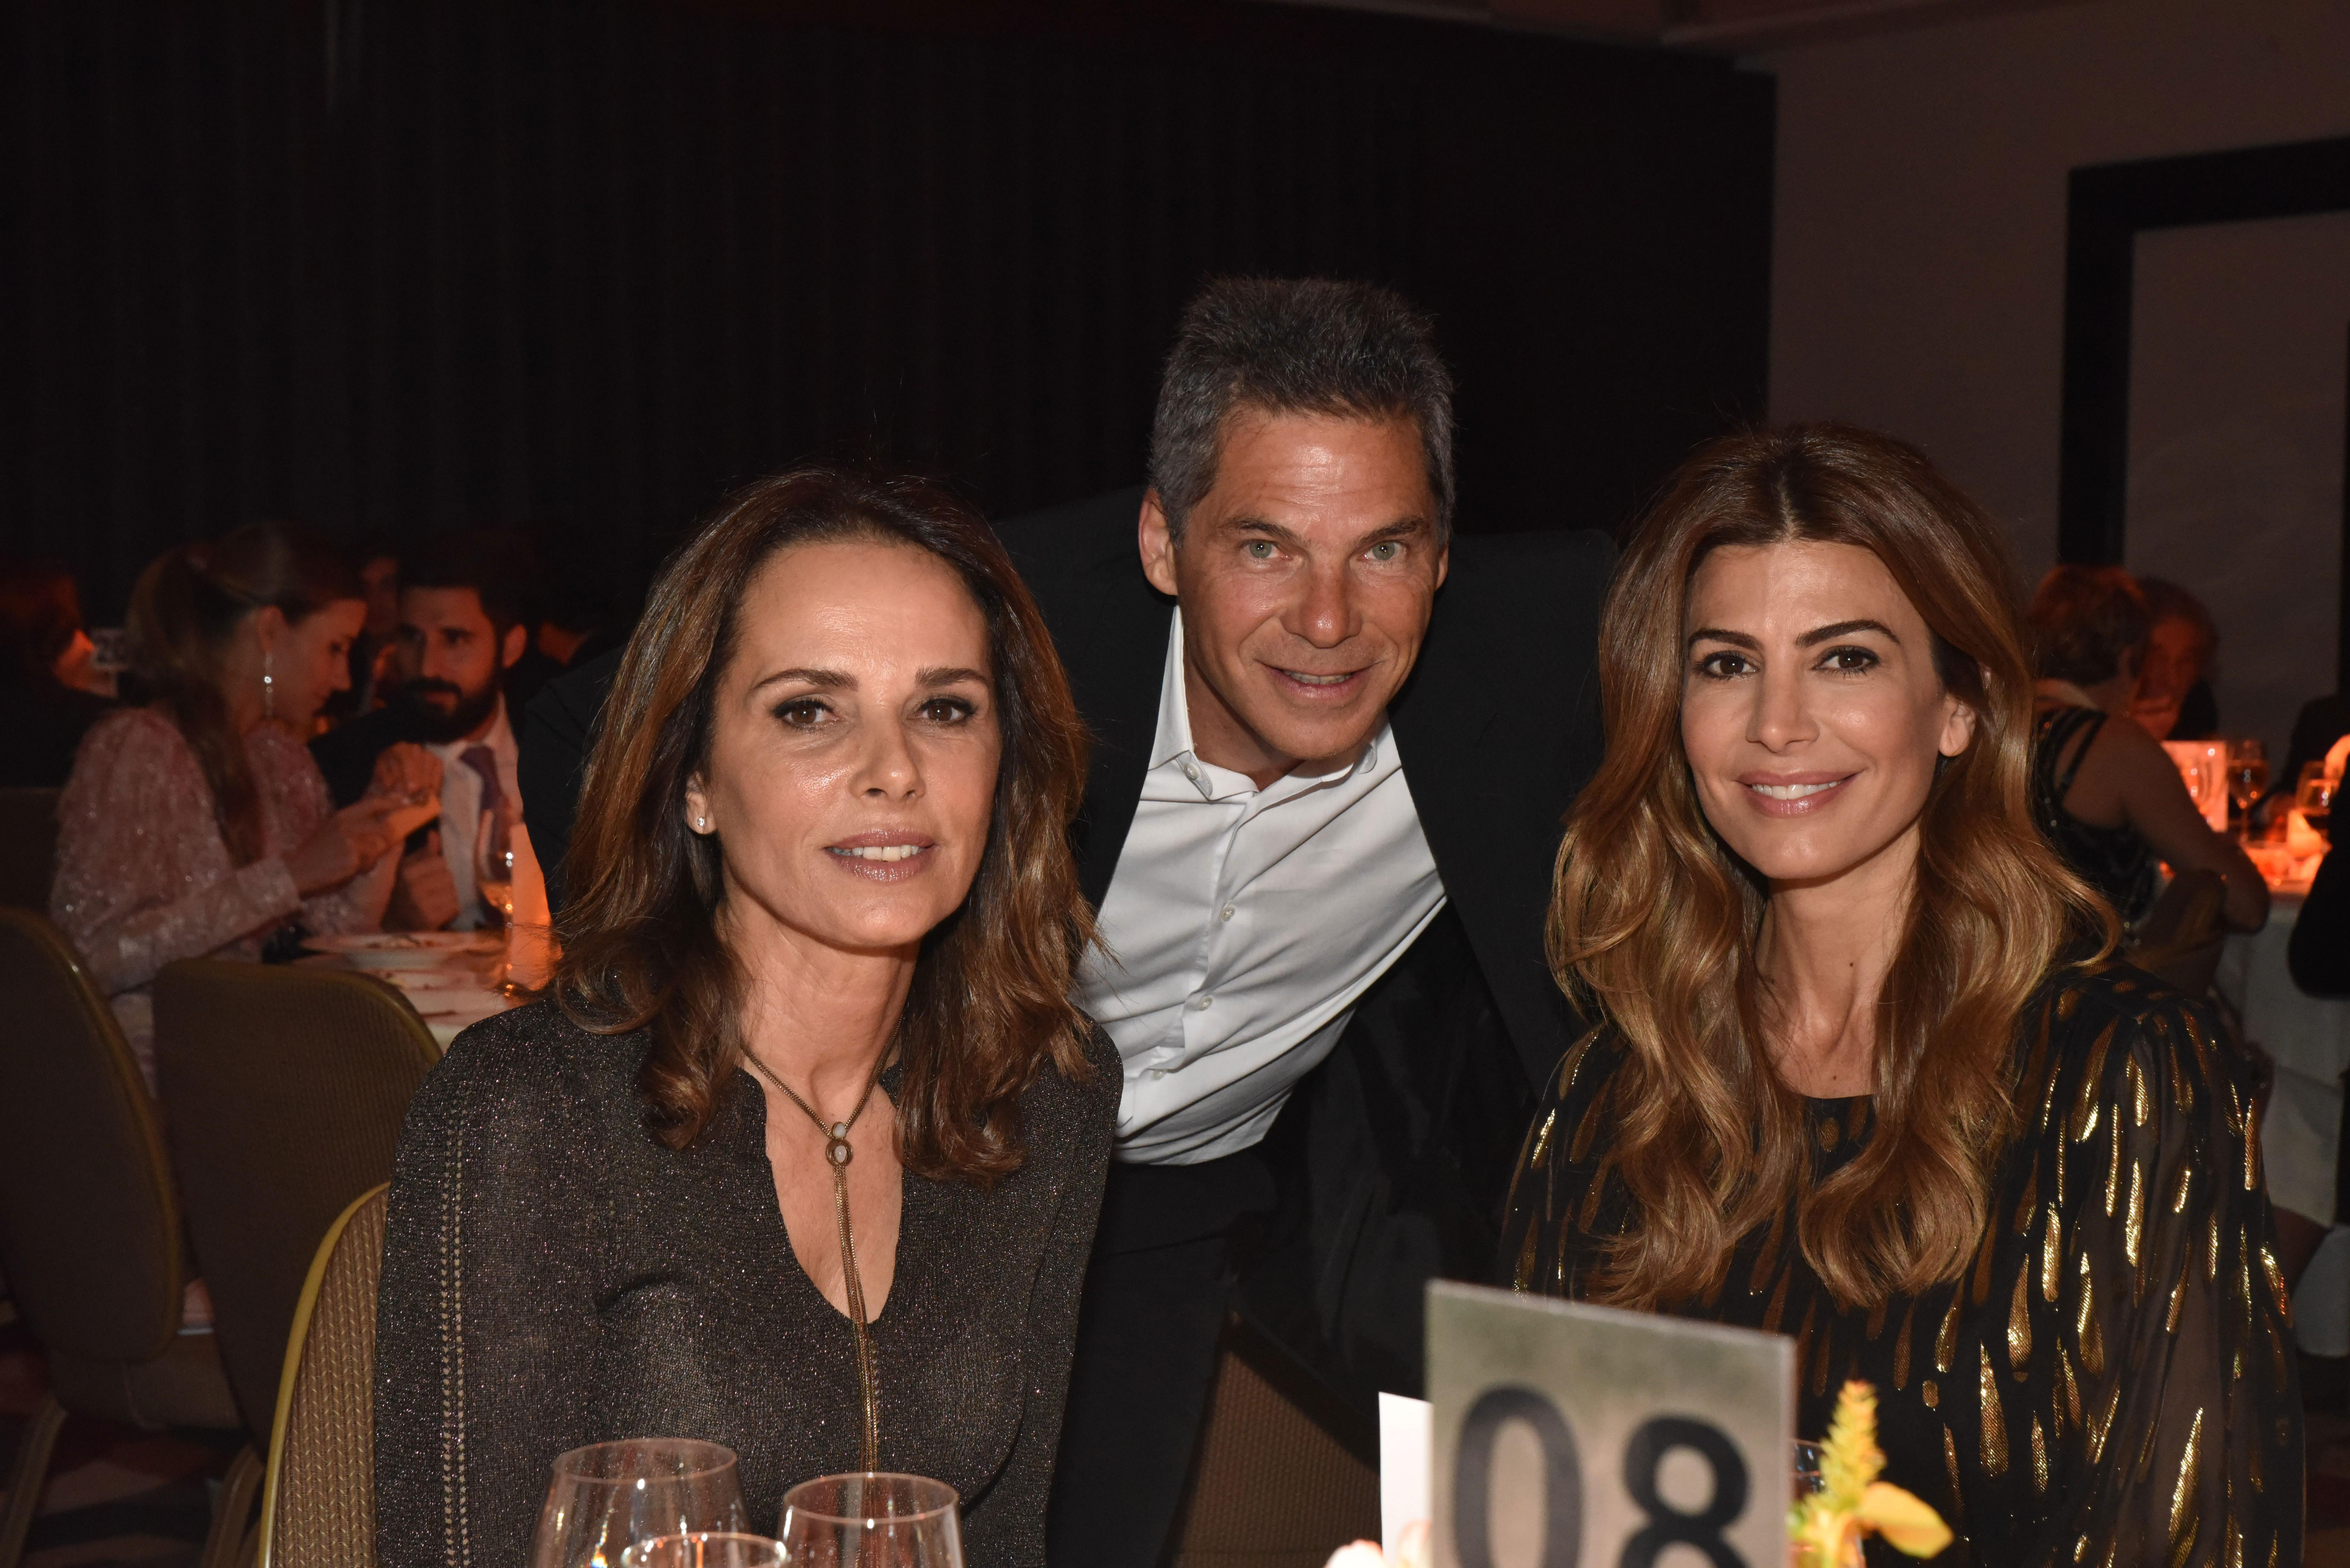 Nathalie y Calilo Sielecki junto a Juliana Awada